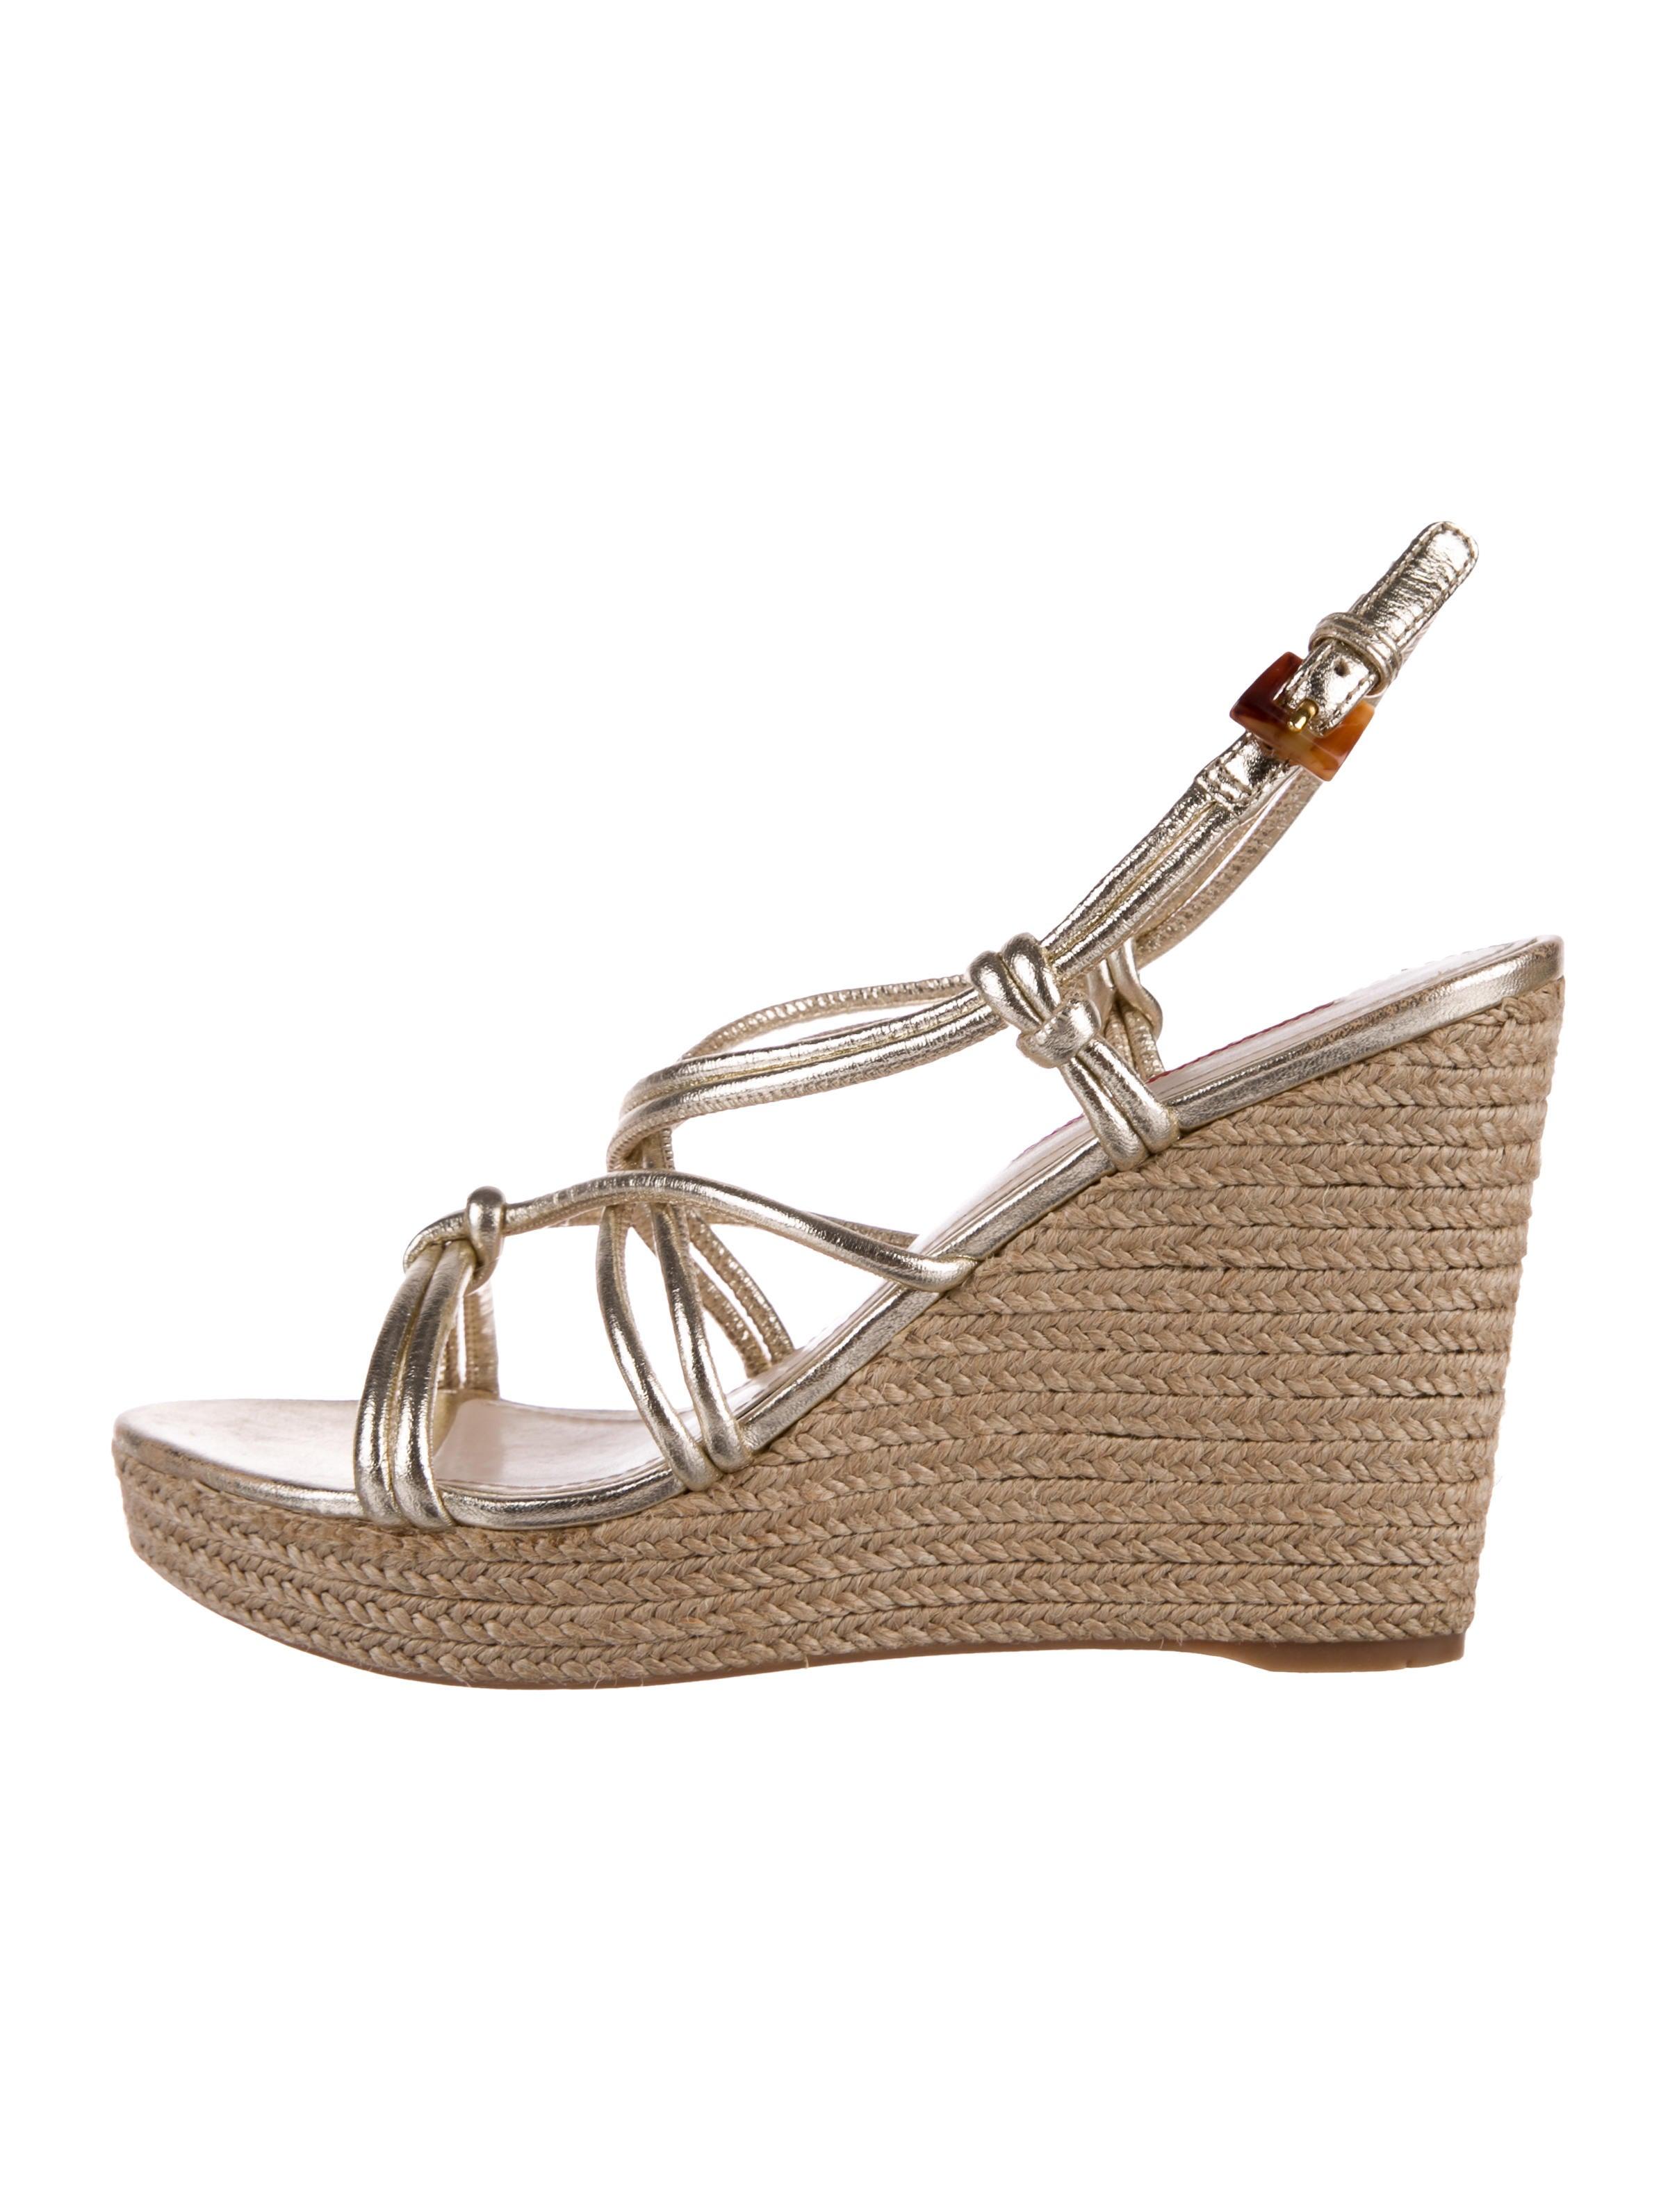 Prada Sport Metallic Wedge Sandals free shipping marketable free shipping 100% original 2014 new for sale Shucwh8192